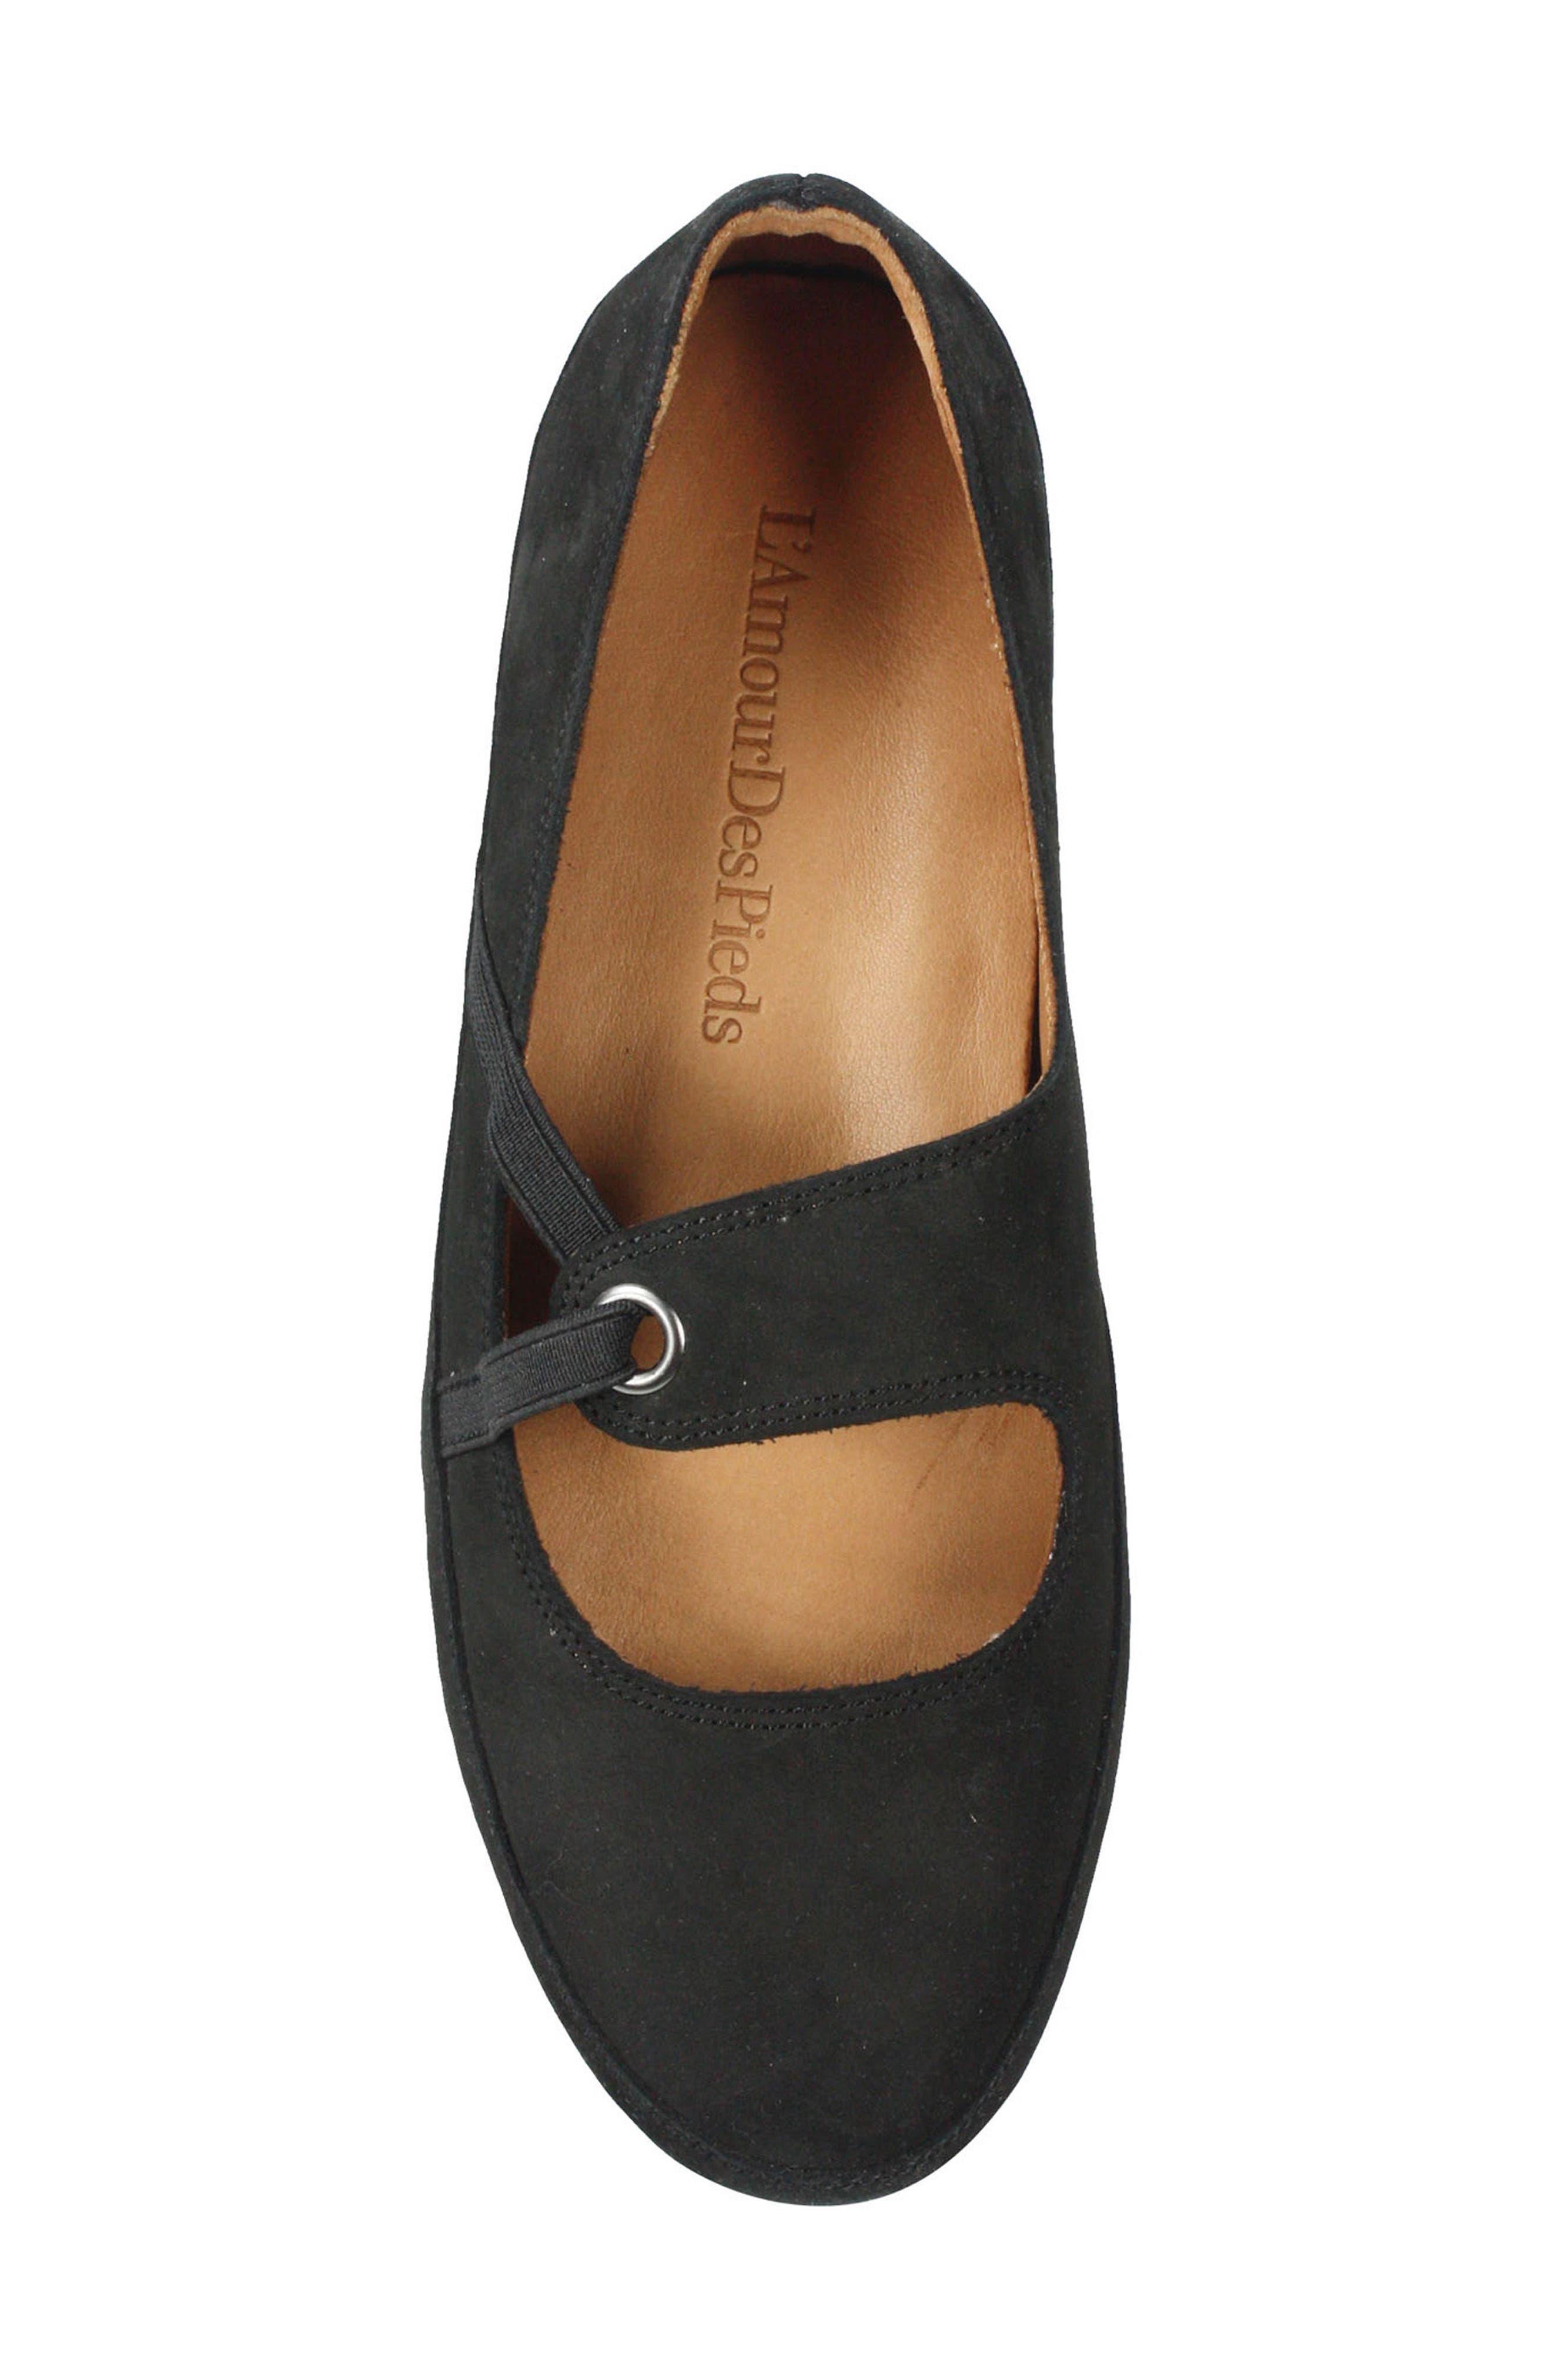 Denisse Mary Jane Flat,                             Alternate thumbnail 5, color,                             Black Nubuck Leather